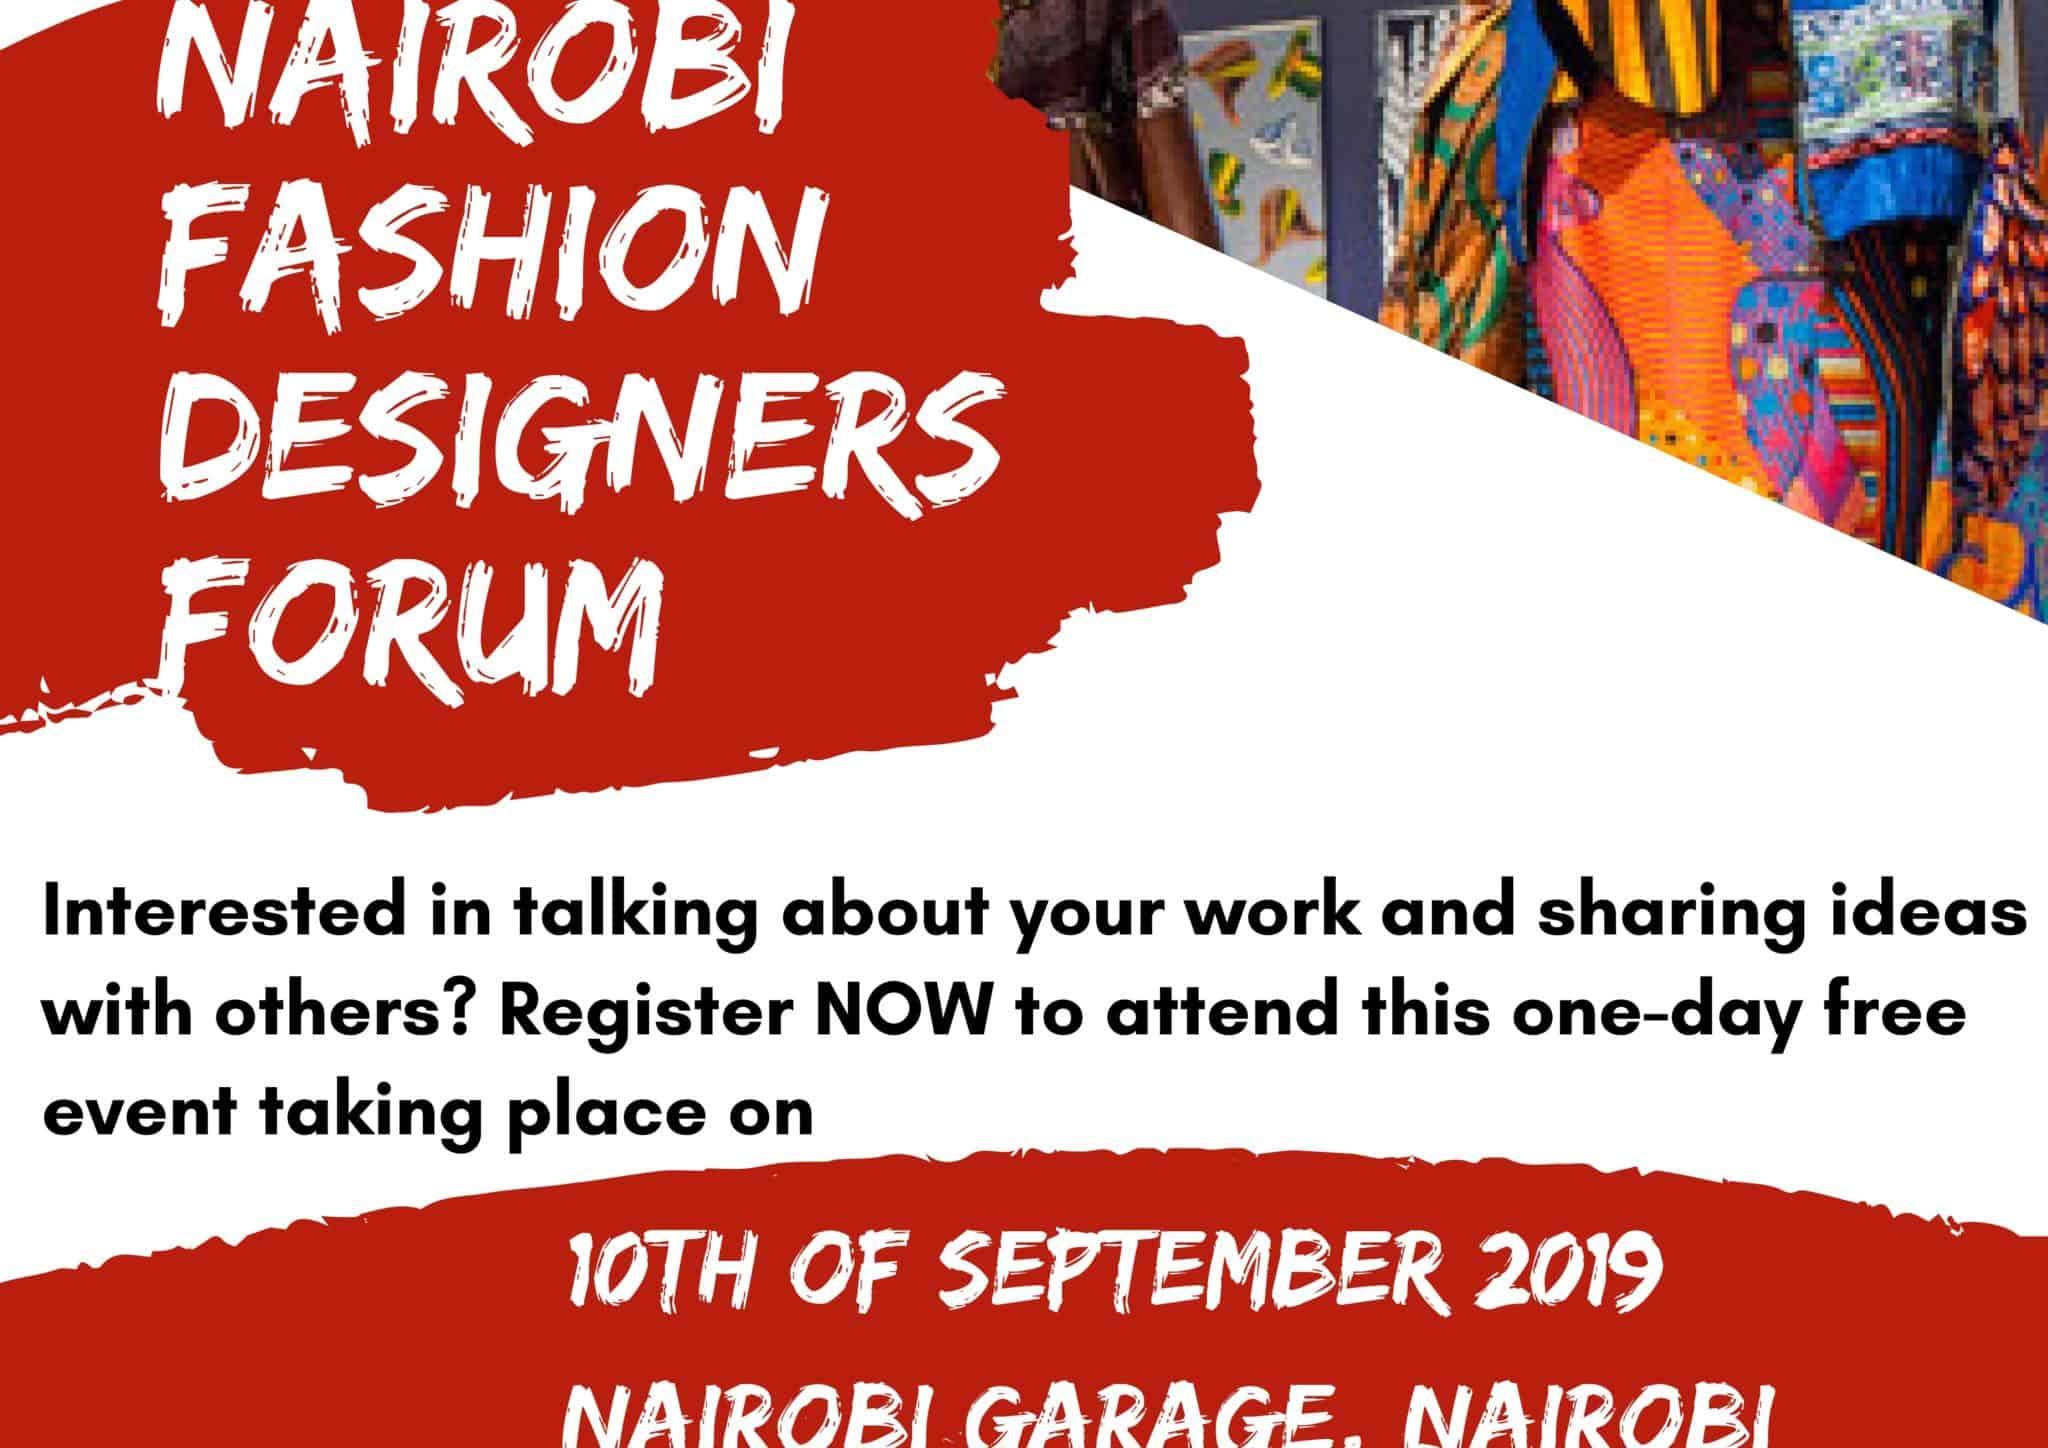 Fashion events in Nairobi